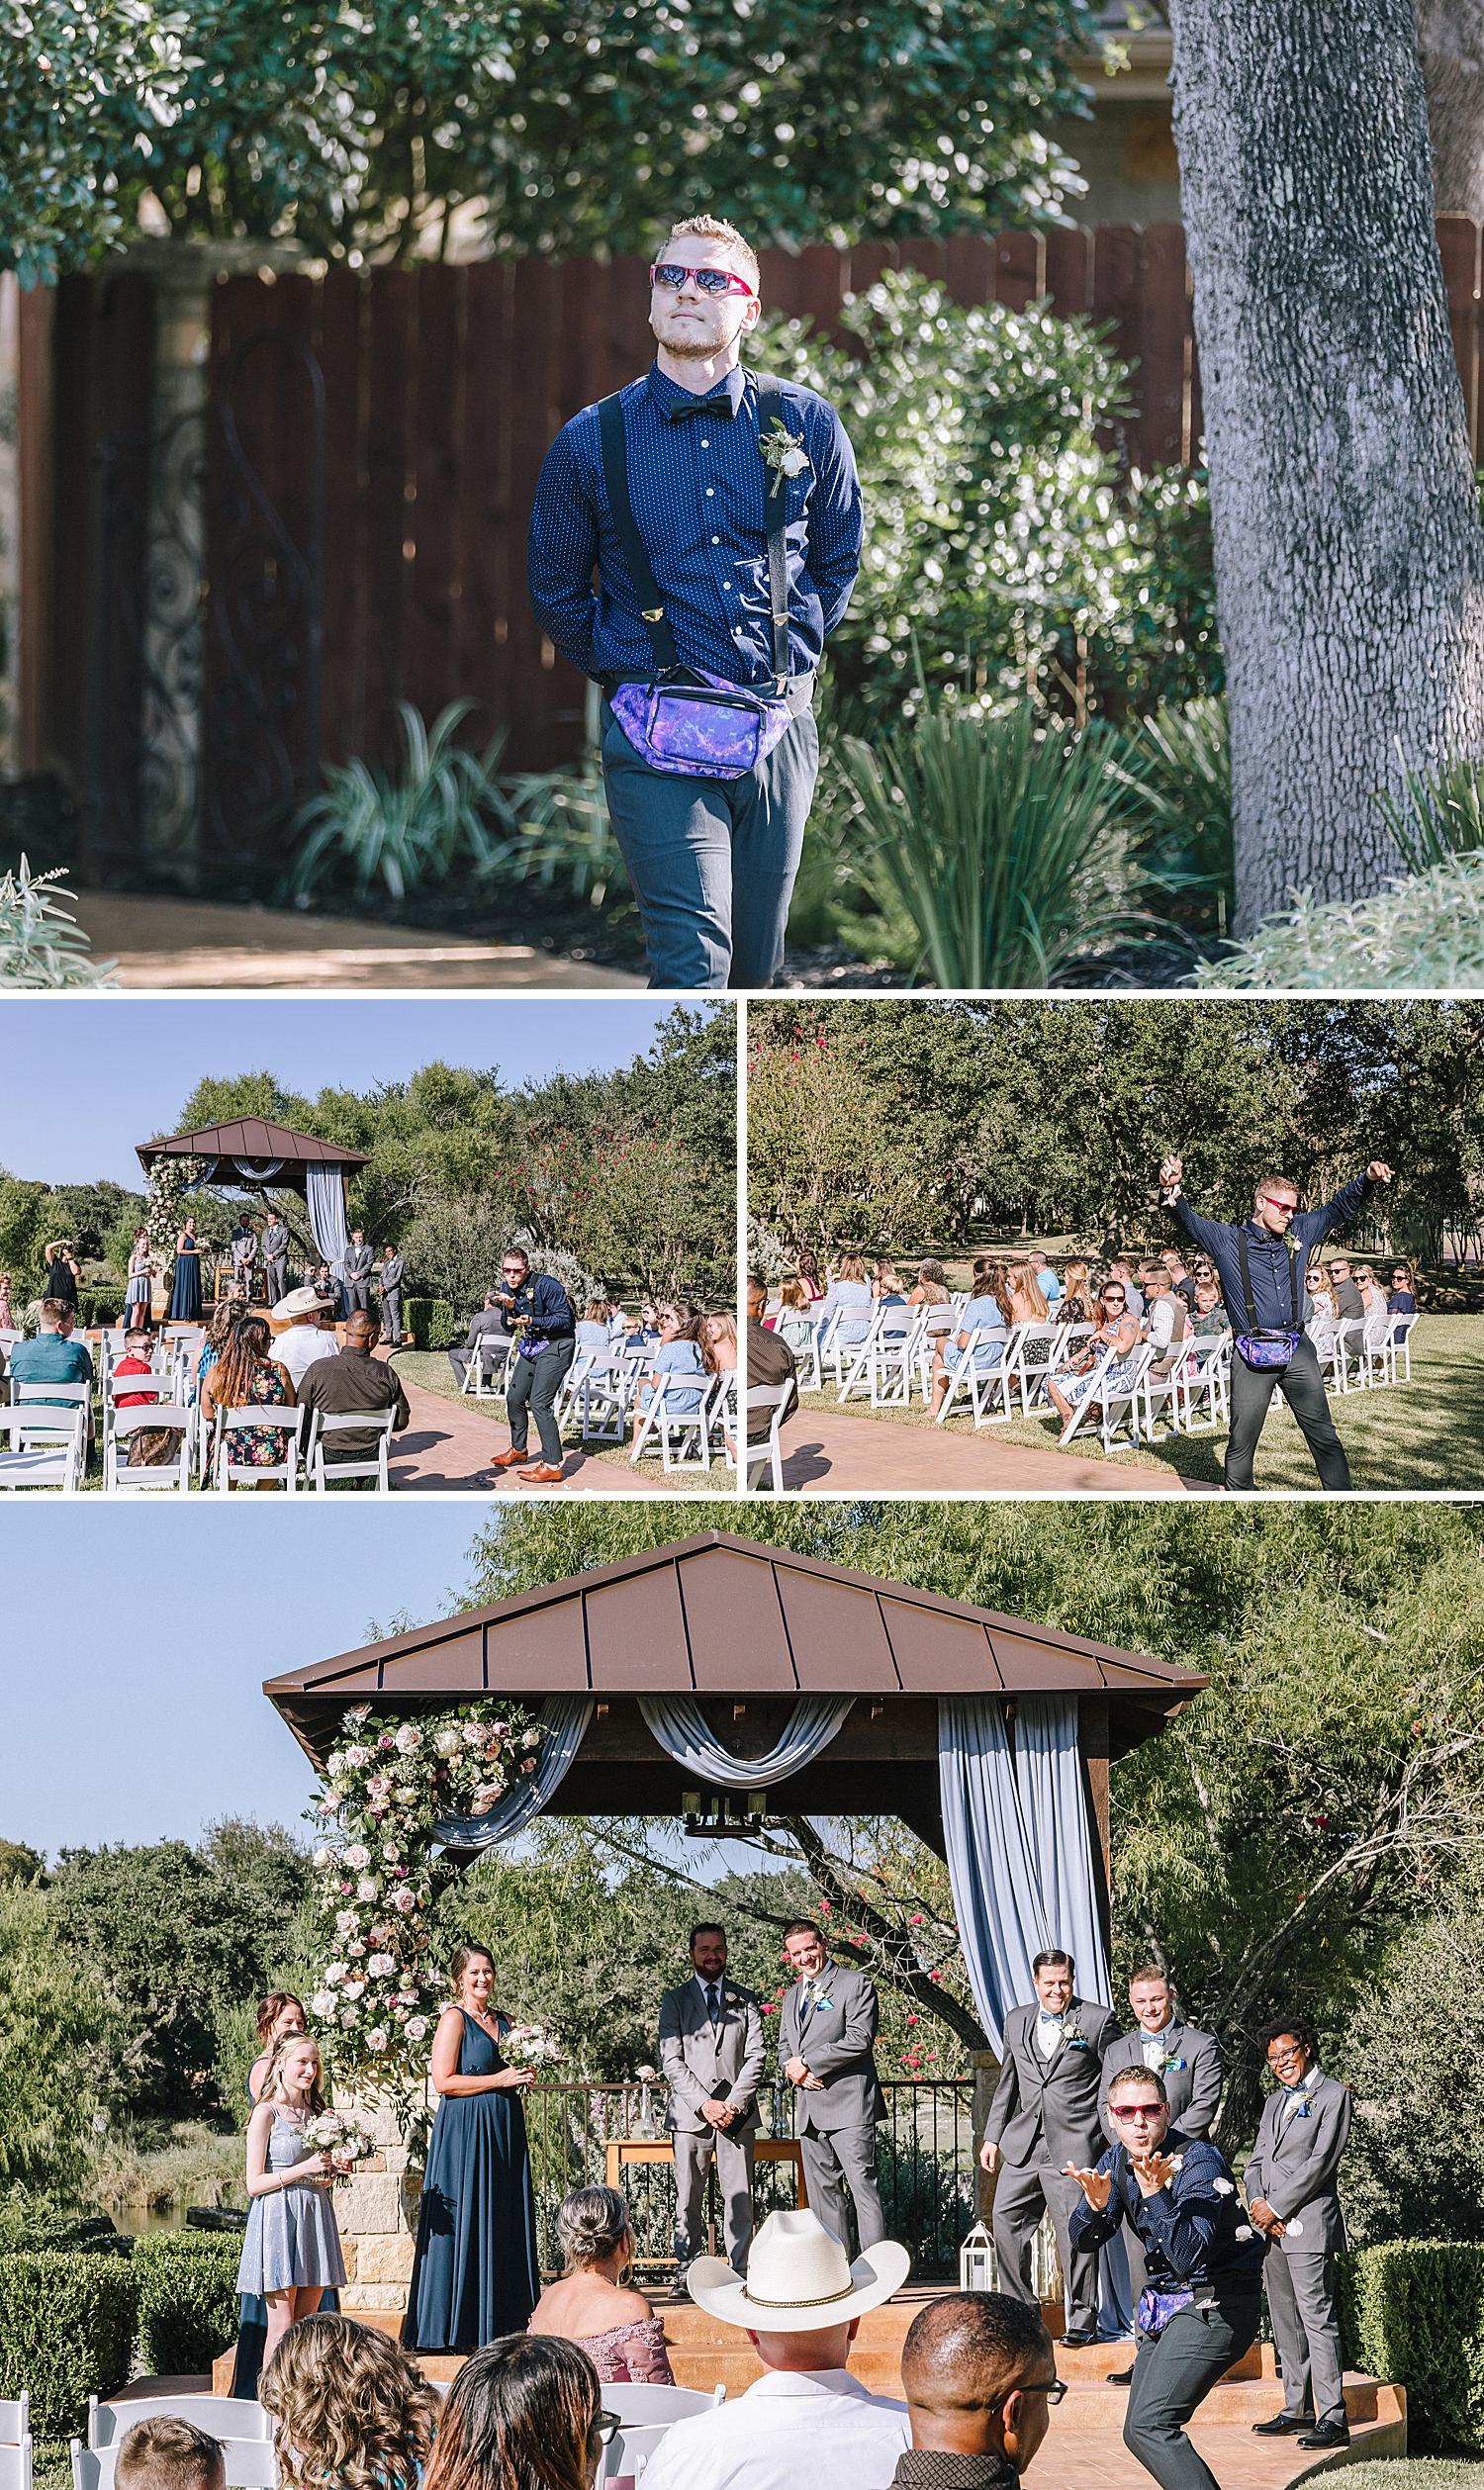 The-Club-at-Garden-Ridge-Military-Wedding-Carly-Barton-Photography_0067.jpg